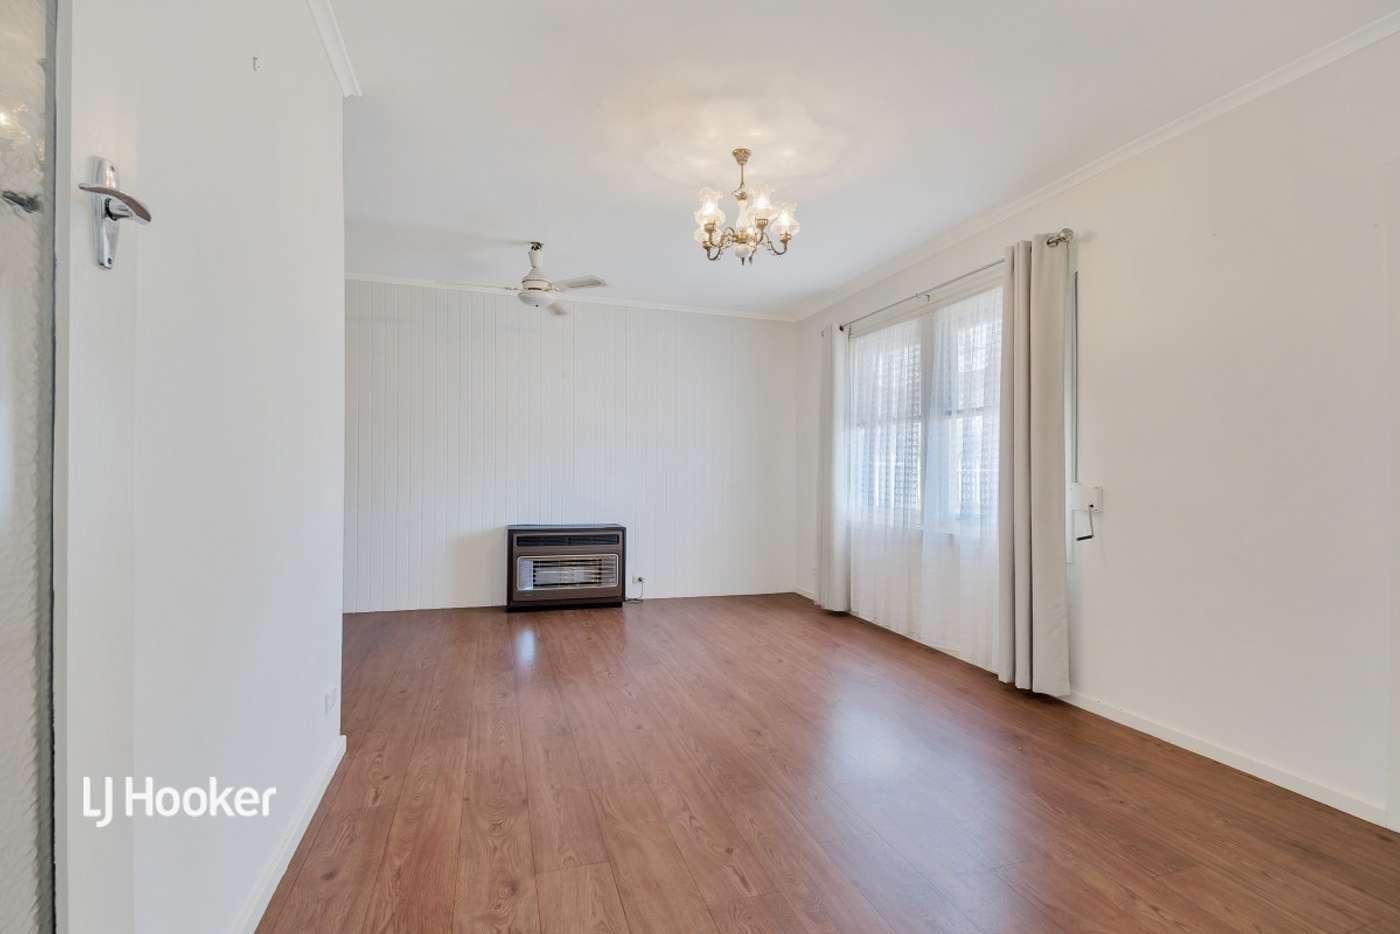 Sixth view of Homely house listing, 54B Dulkara Road, Ingle Farm SA 5098